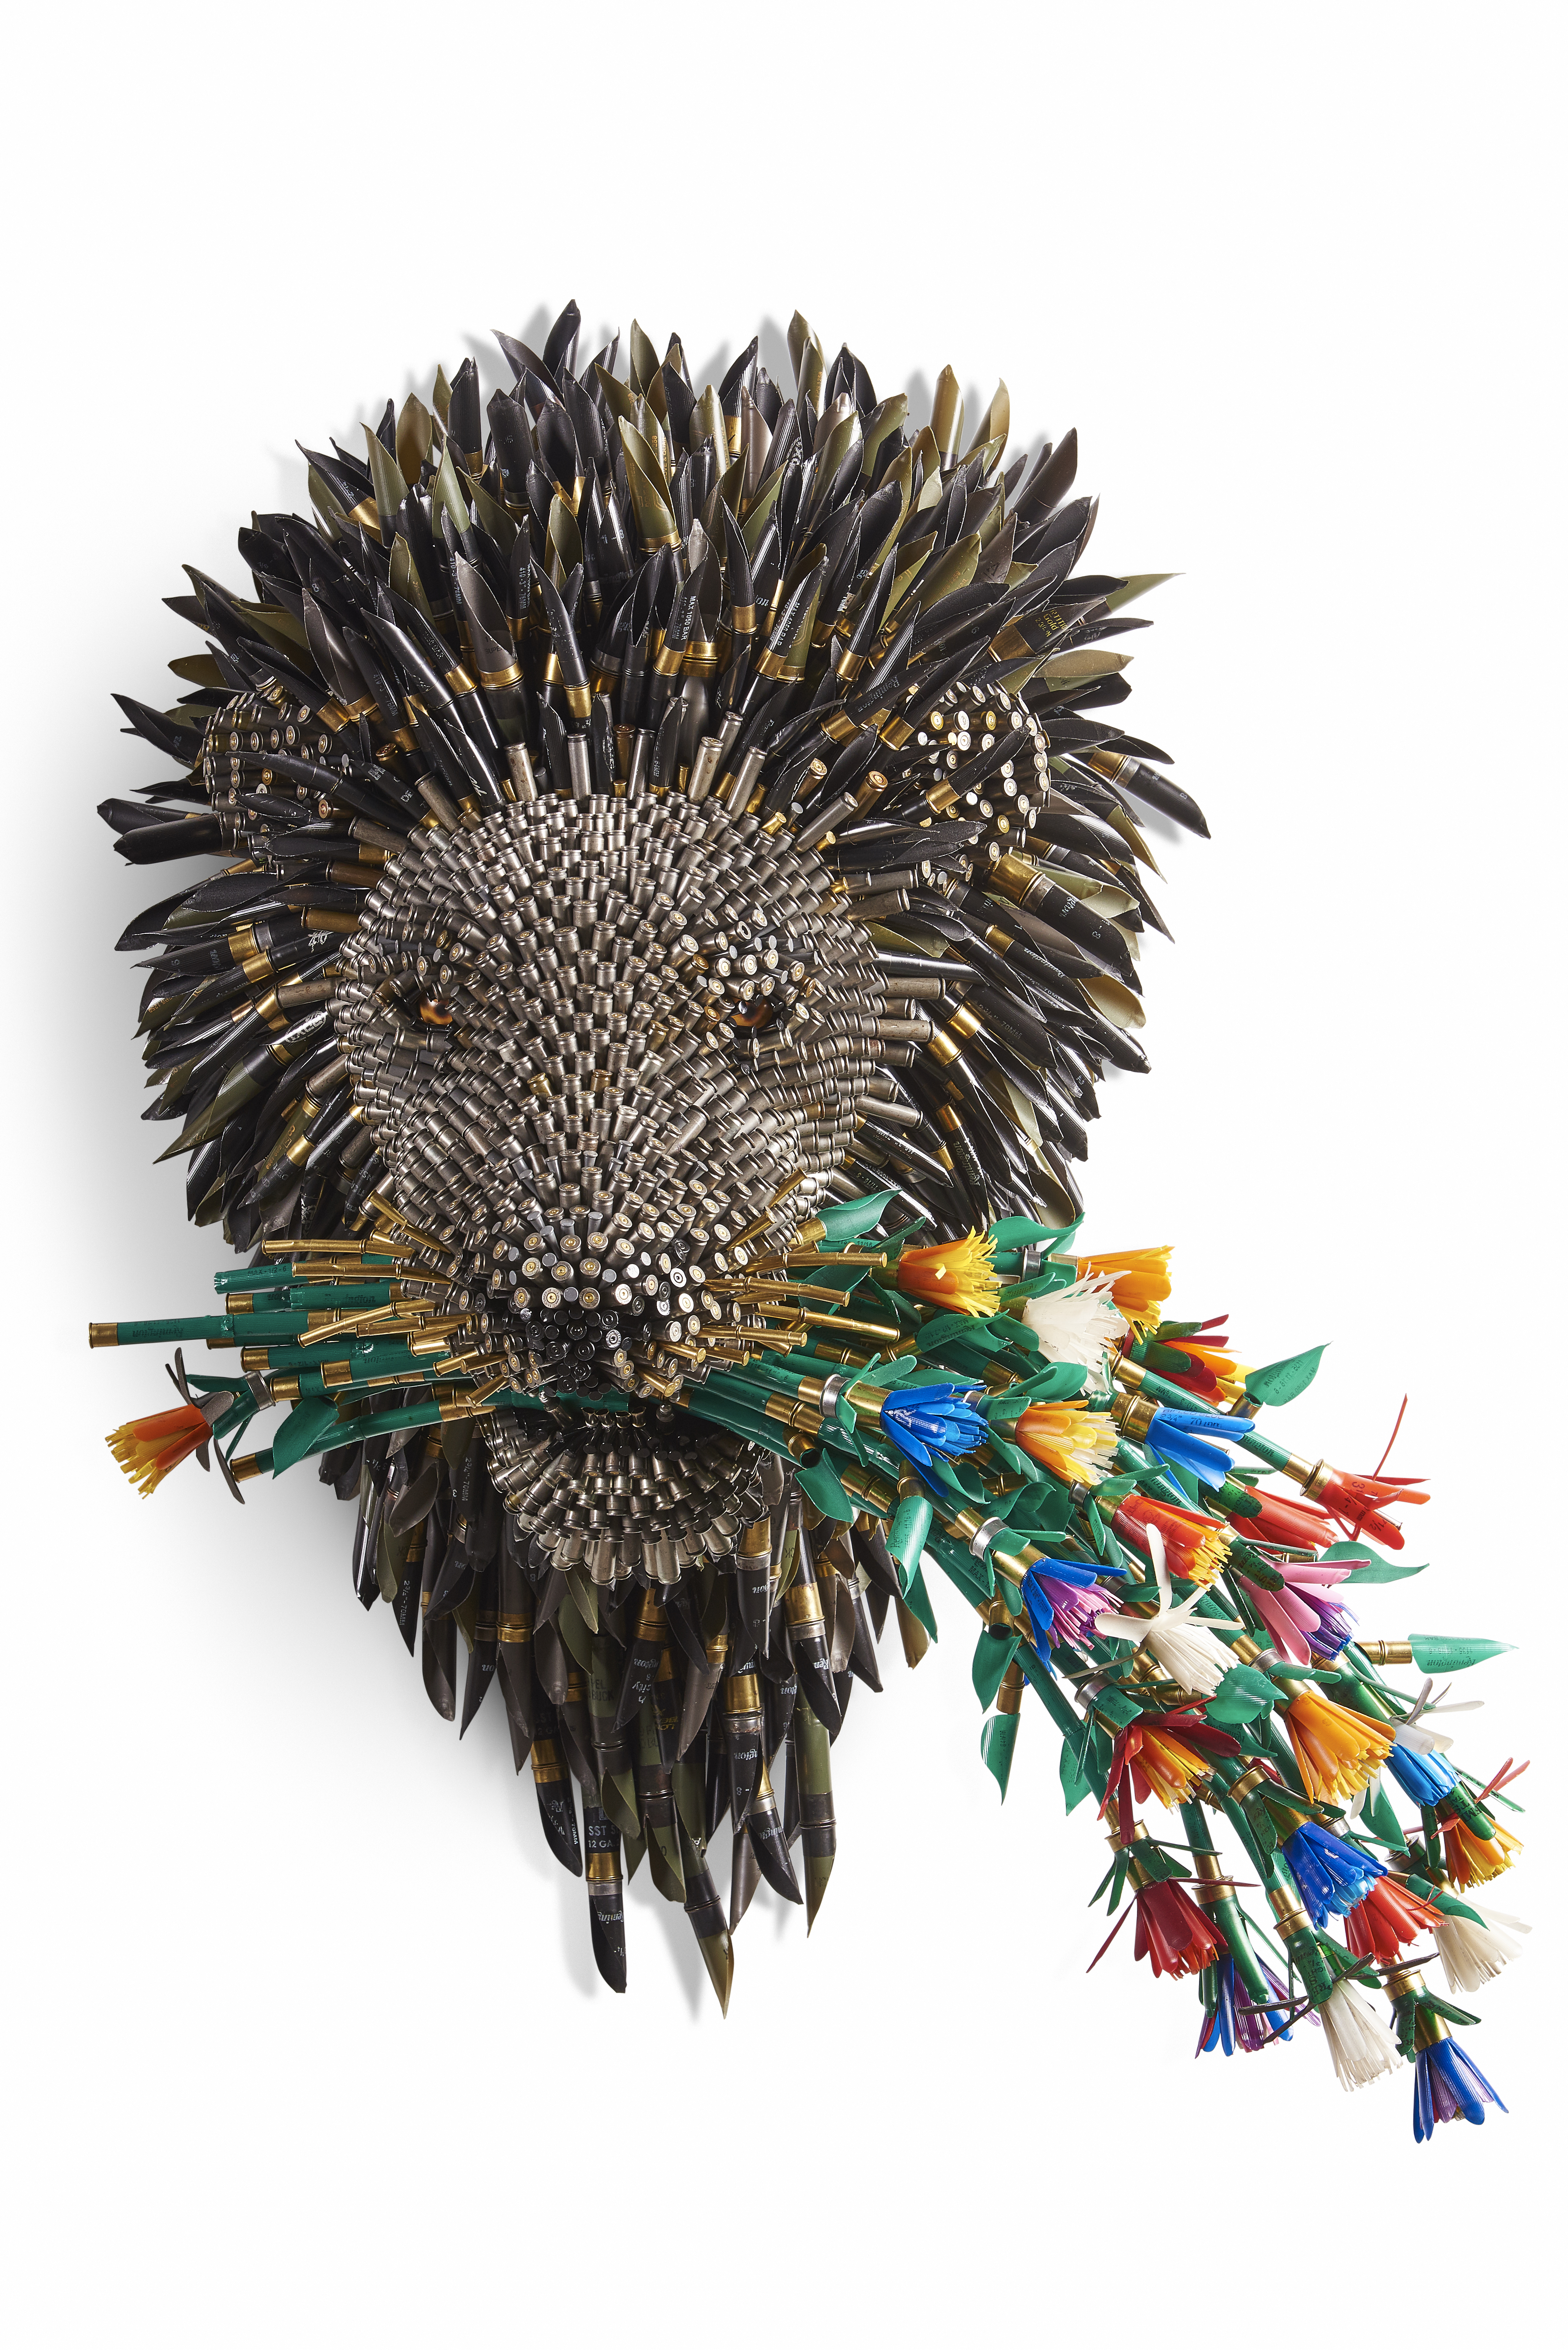 courtesy Adelson Galleries, New York, Boston  bullet shell art, avant-garde, art, fine art, artist, gallery, art gallery, exhibit, Impressionism, Realism, Modernism